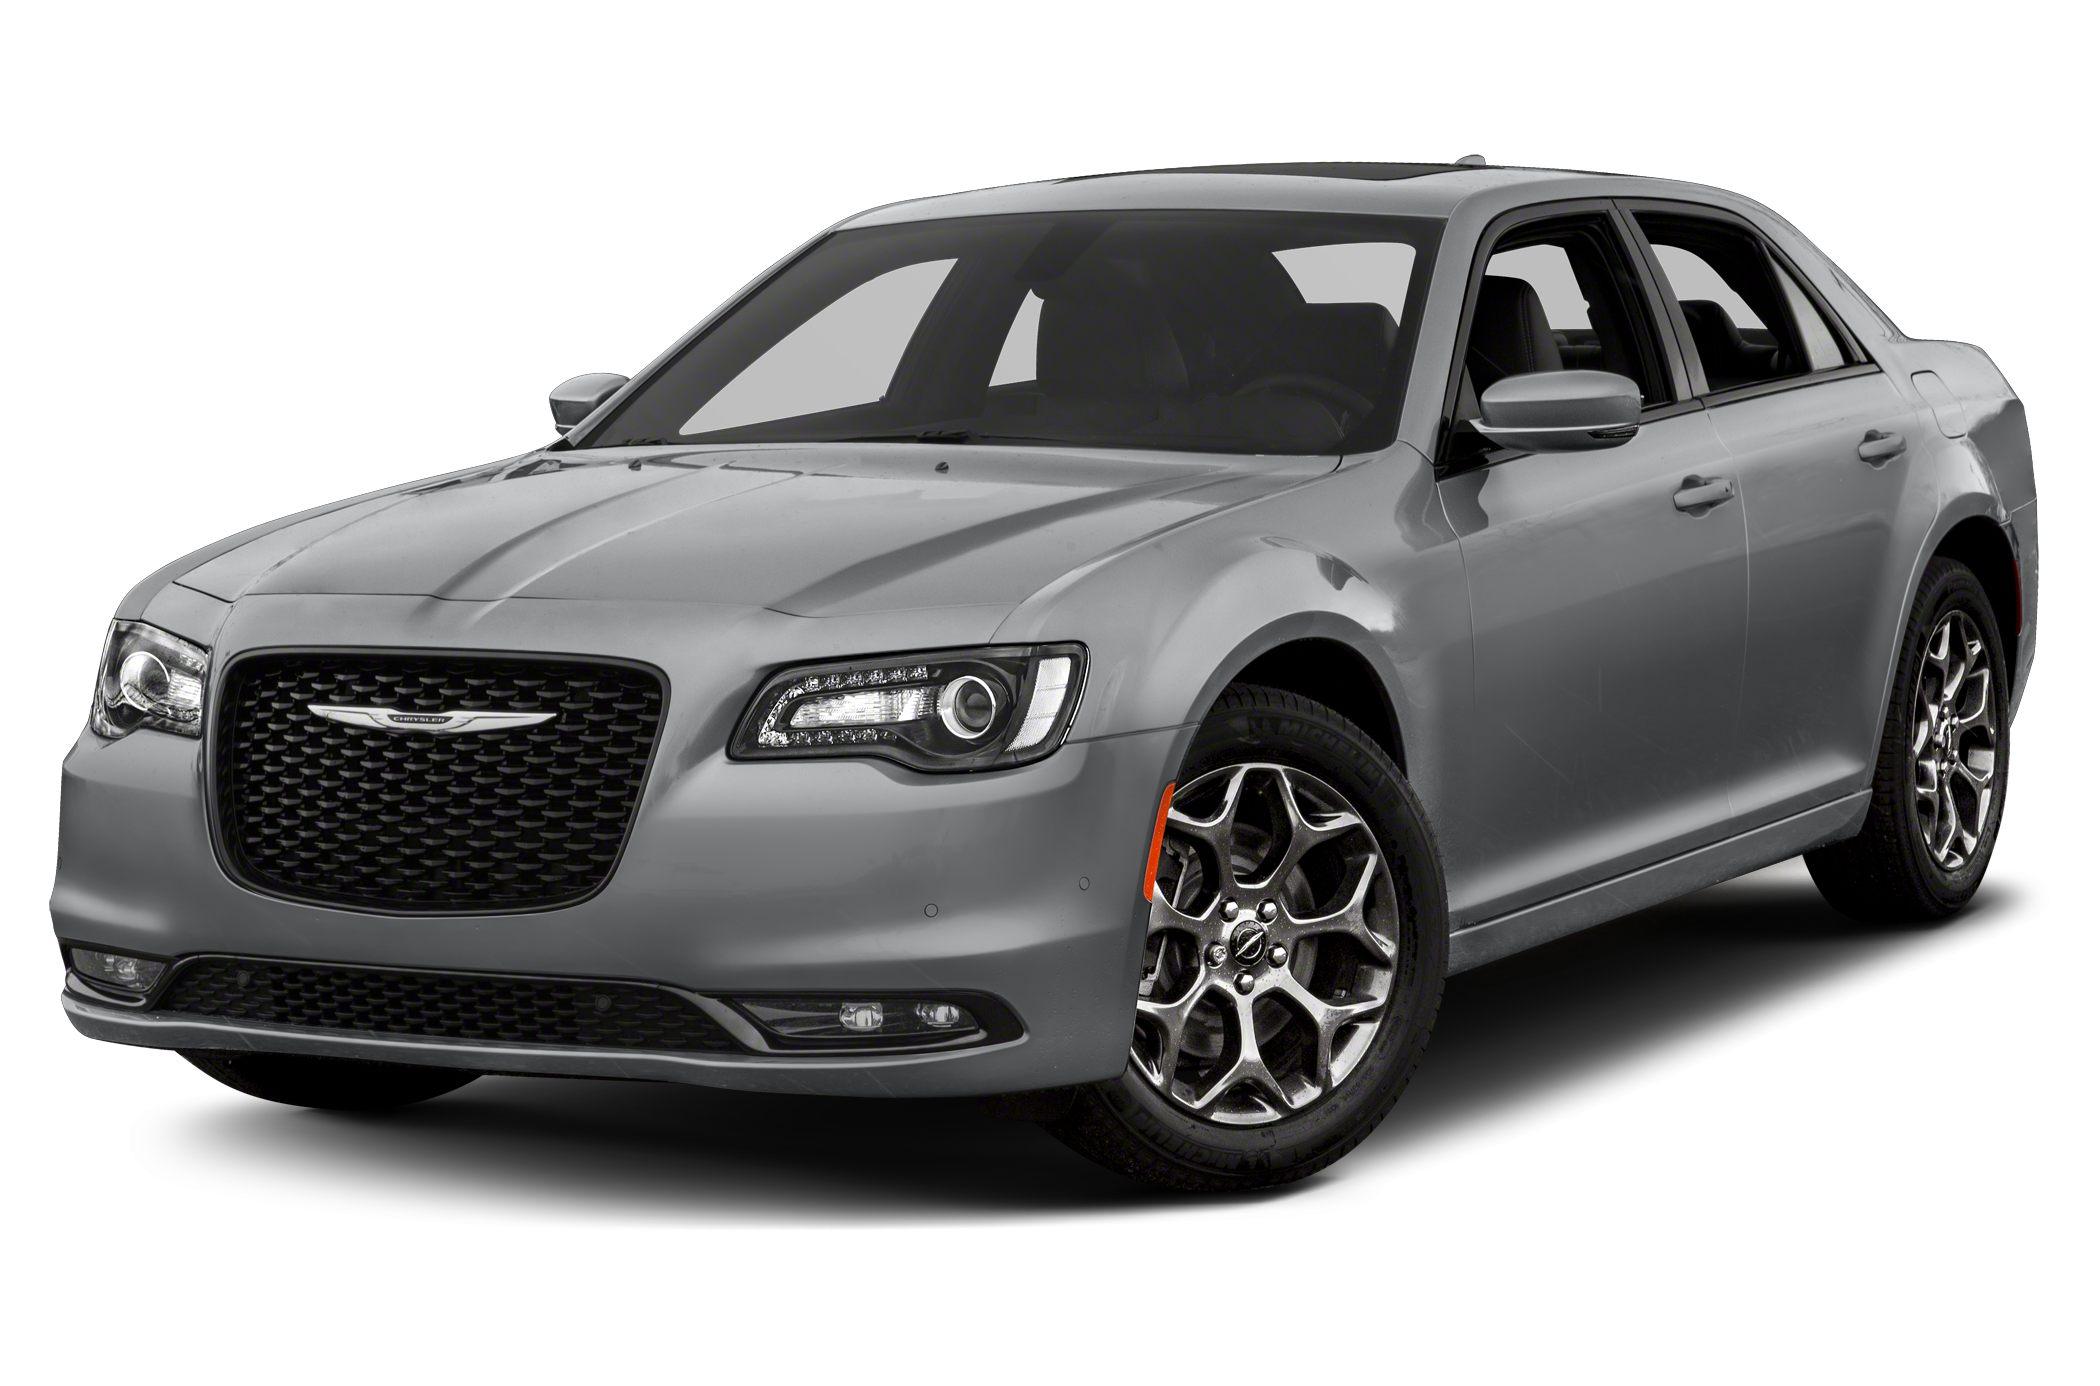 2016 Chrysler 300 S Miles 0Color Bright White Stock 295116 VIN 2C3CCABG2GH295116